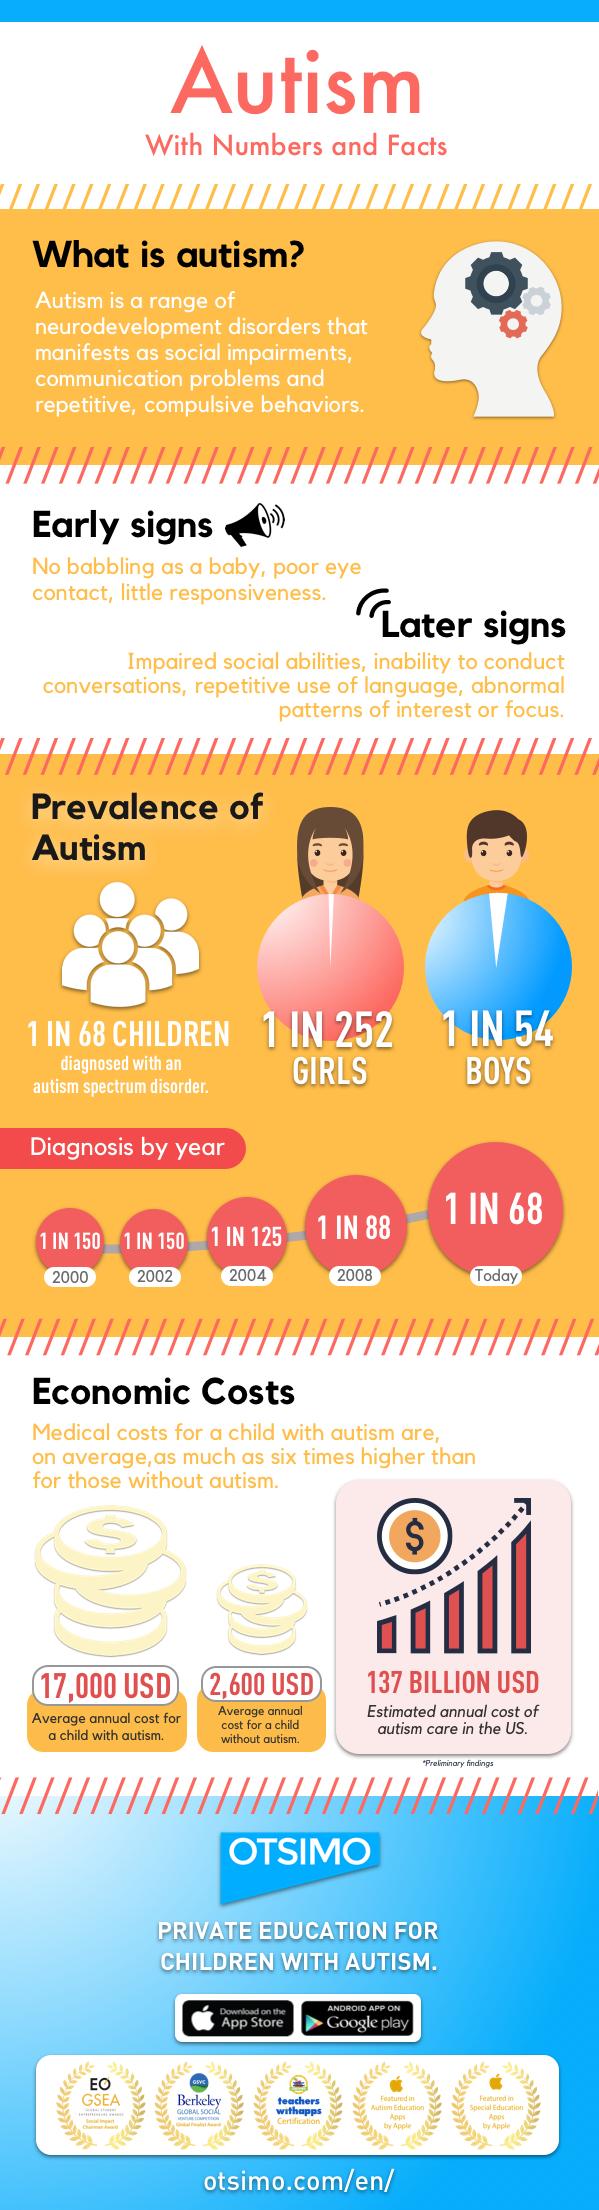 Typical Characteristics of Autism Spectrum Disorder | Otsimo